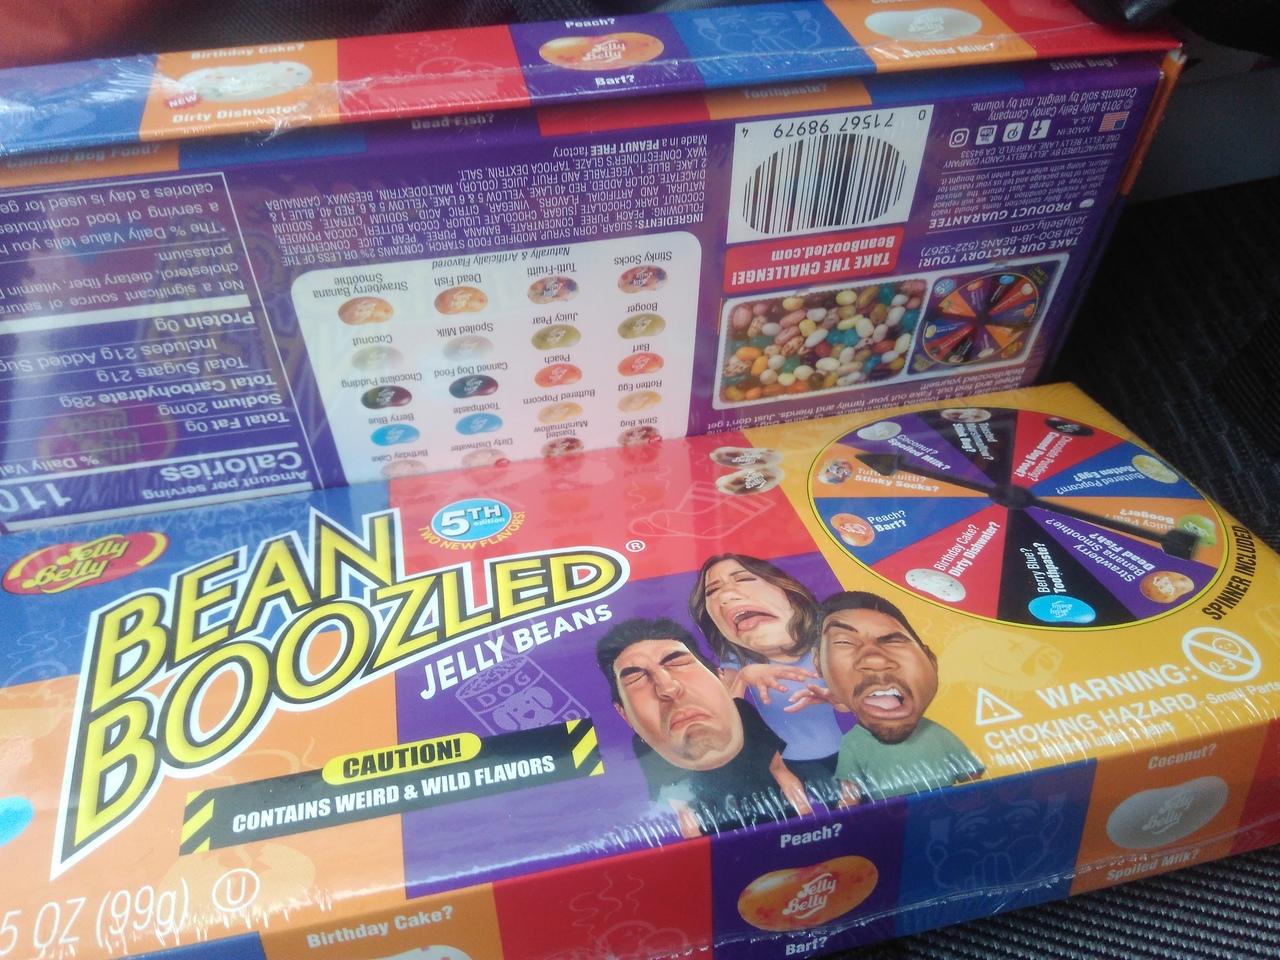 Bean Boozled 5 версия 20 вкусов игра-рулетка НОВИНКА